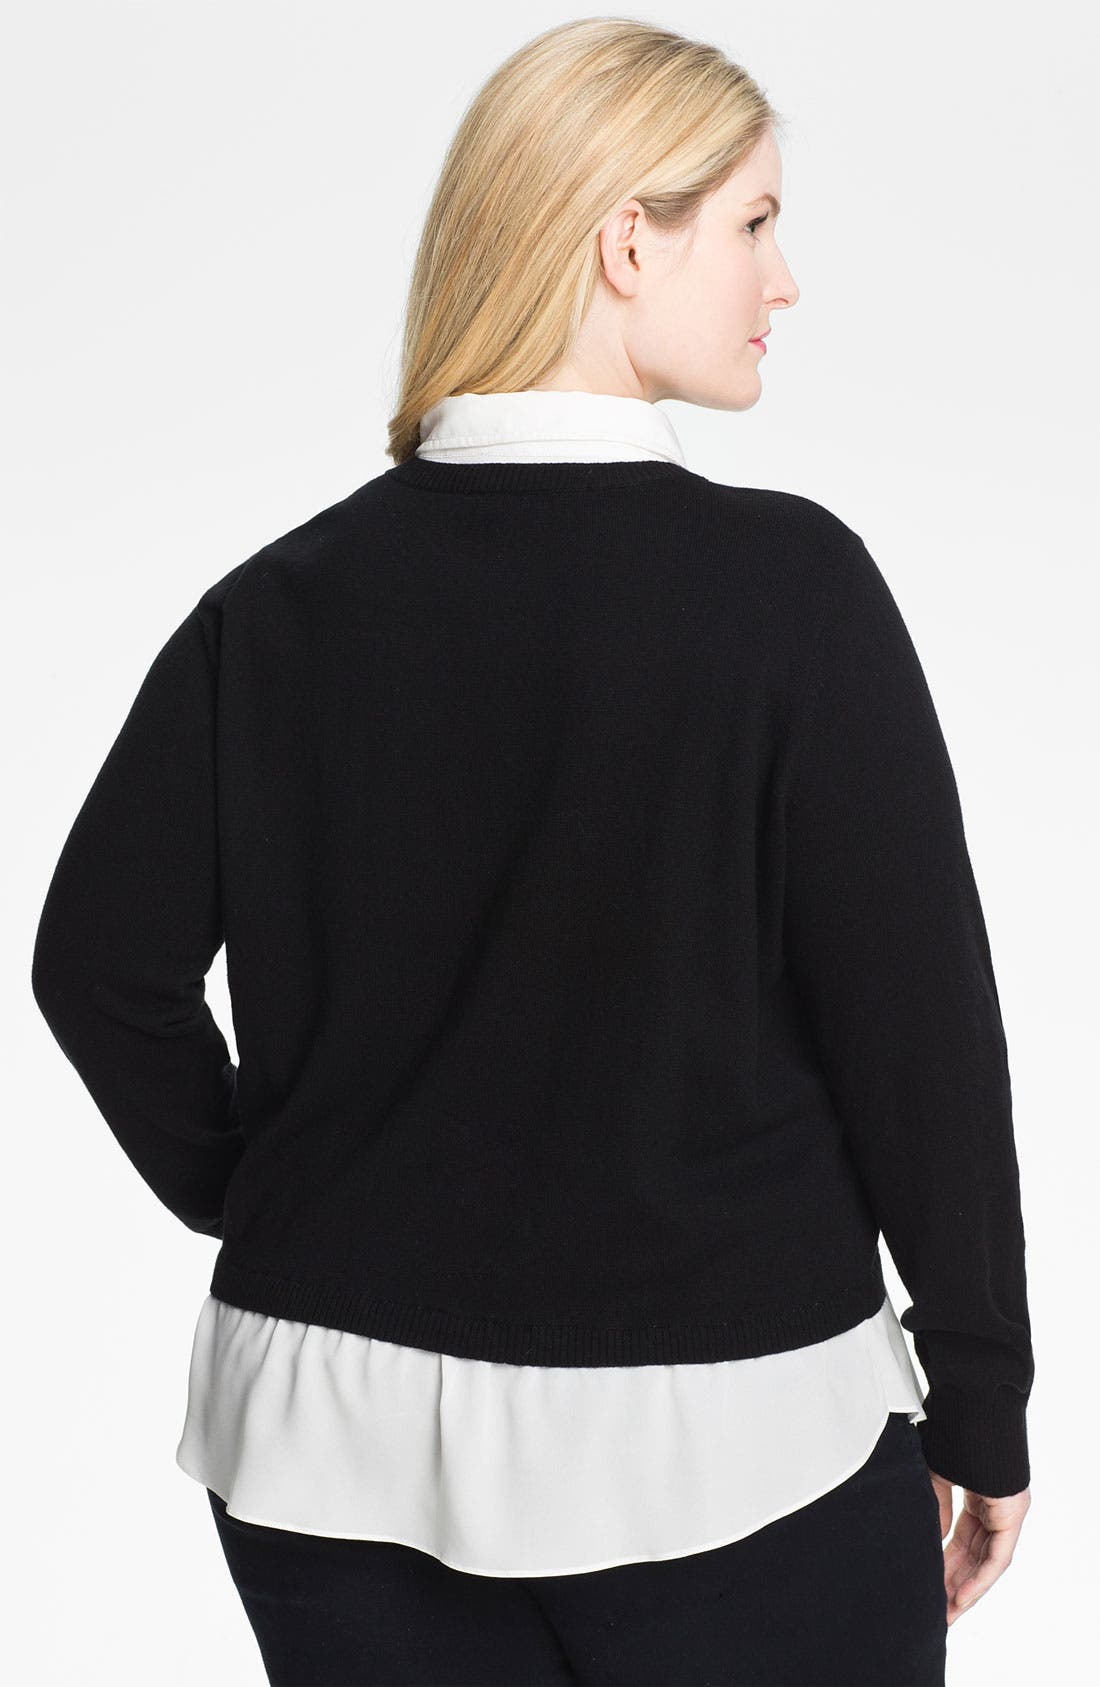 Alternate Image 2  - DKNYC Layered Look Sweater (Plus)